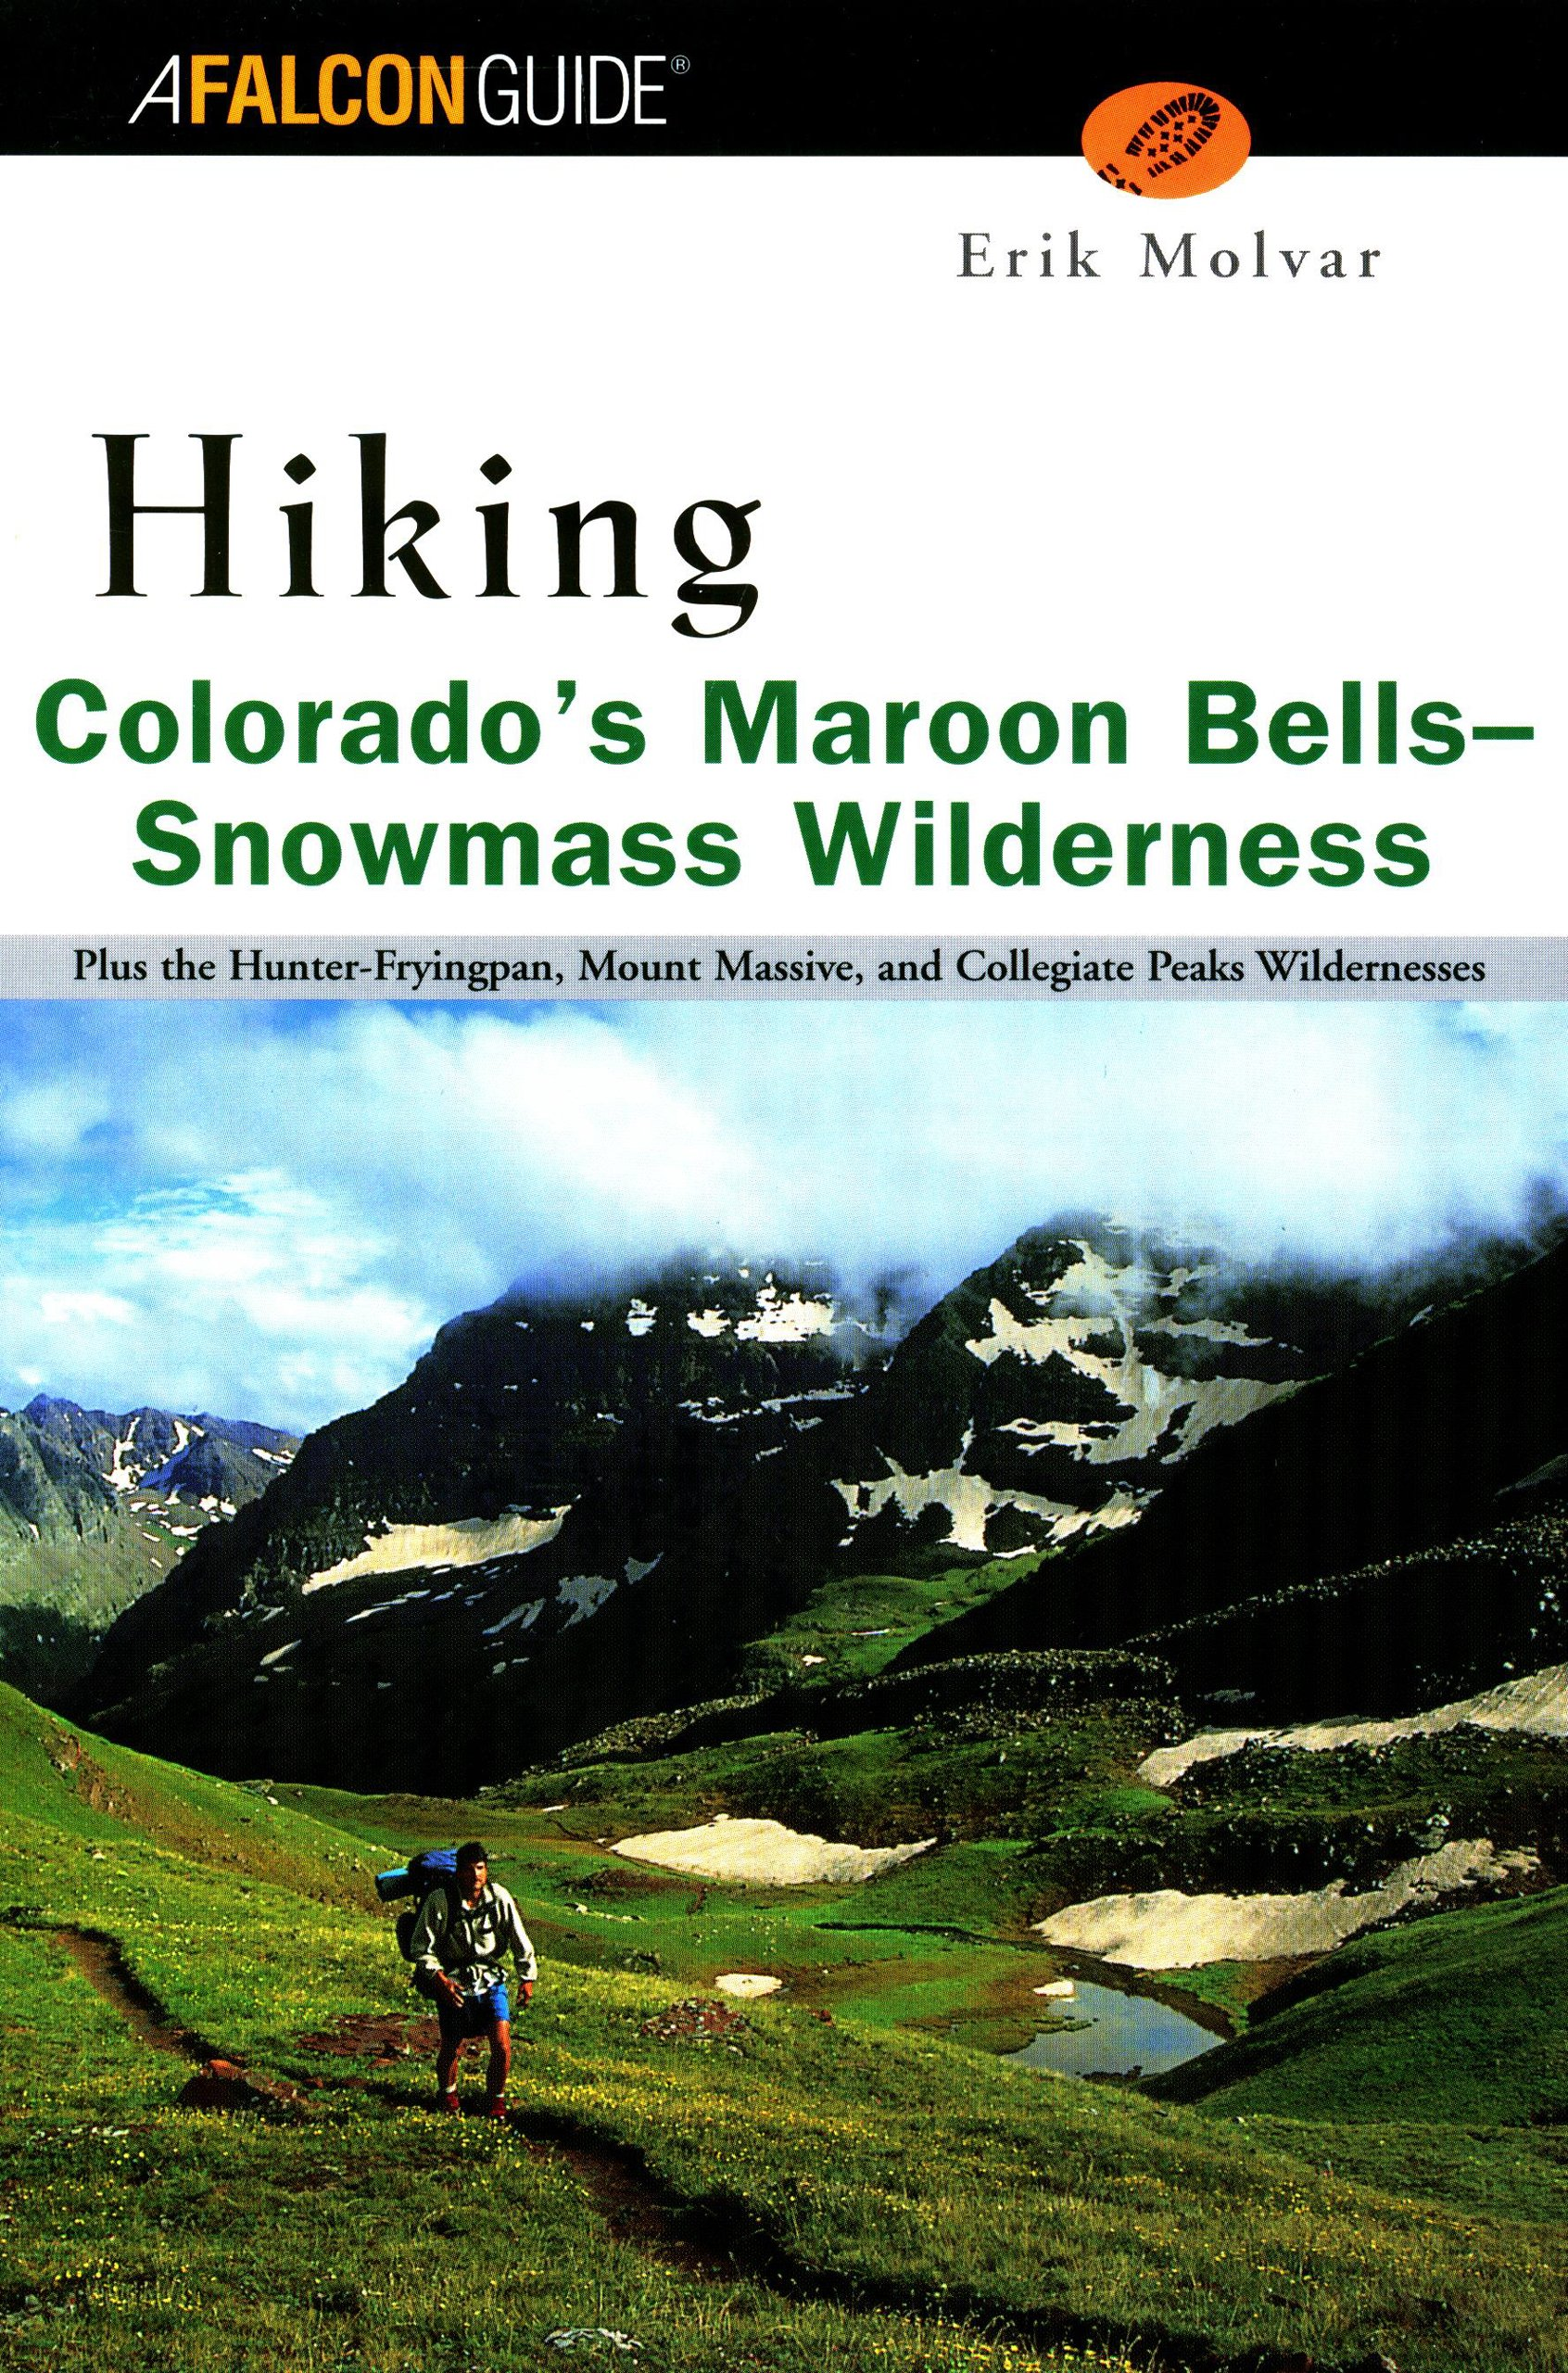 Hiking Colorados Bells Snowmass Wilderness Regional